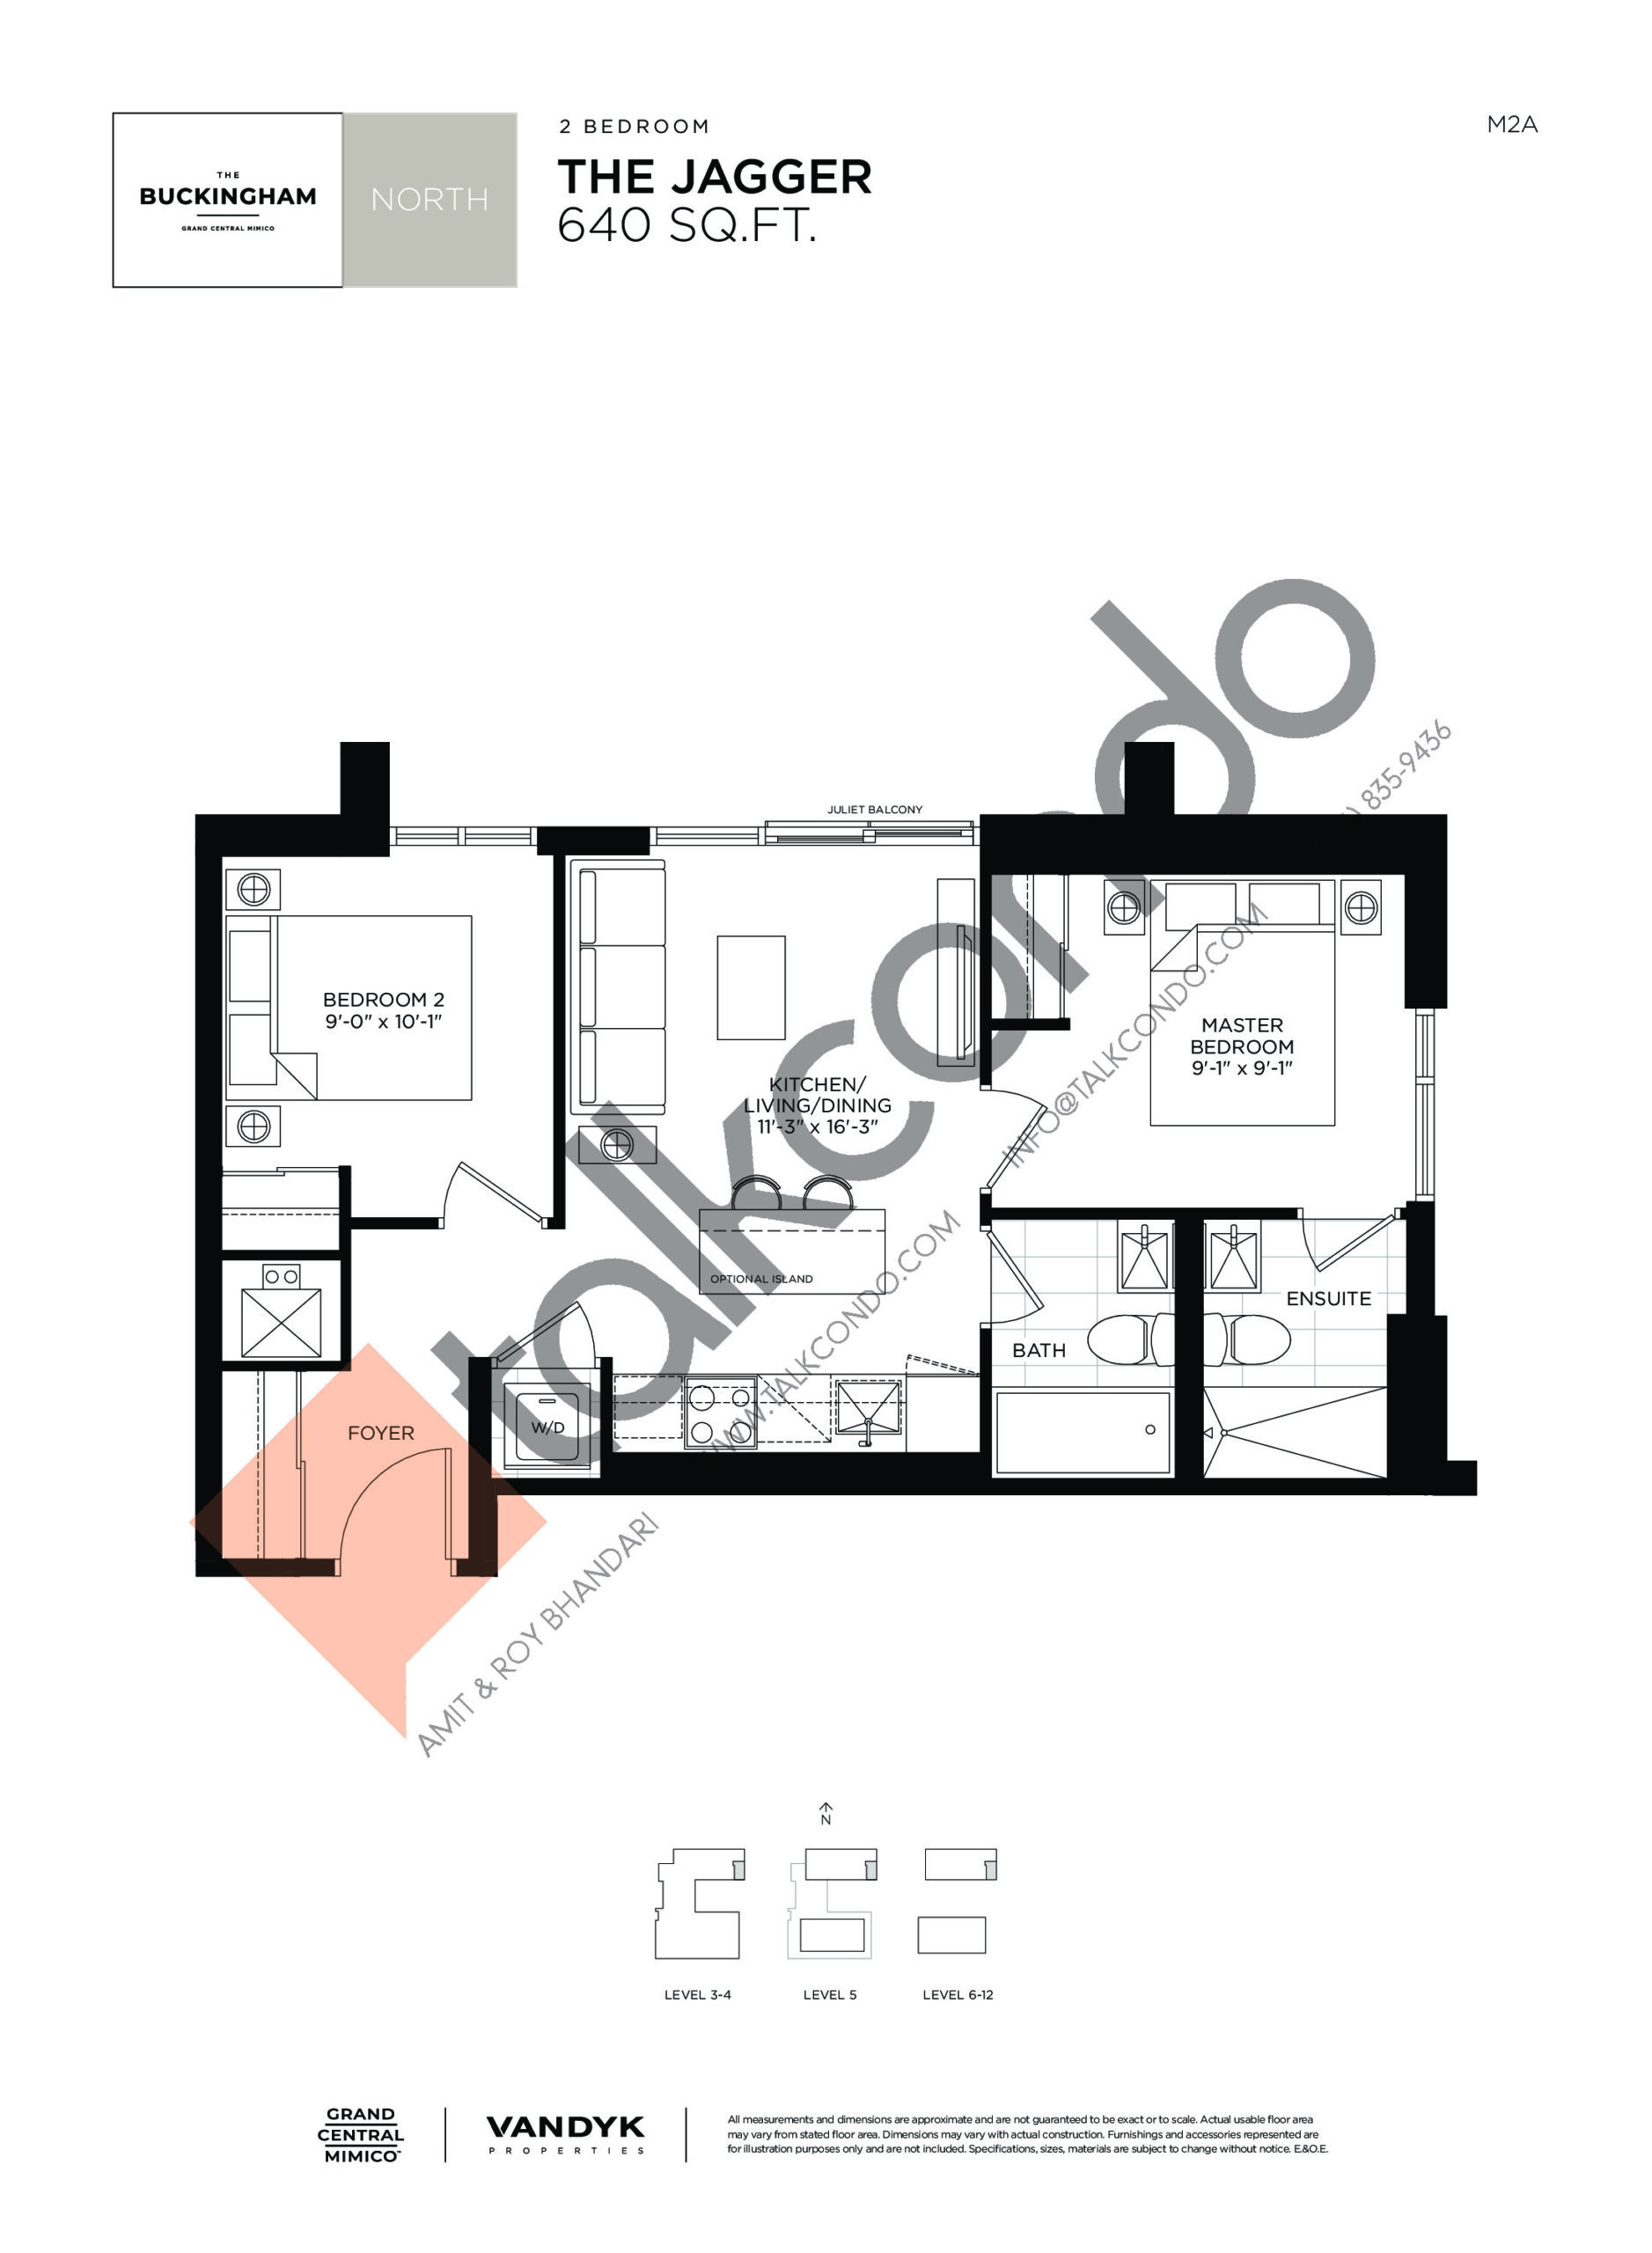 The Jagger Floor Plan at Grand Central Mimico Condos - 640 sq.ft